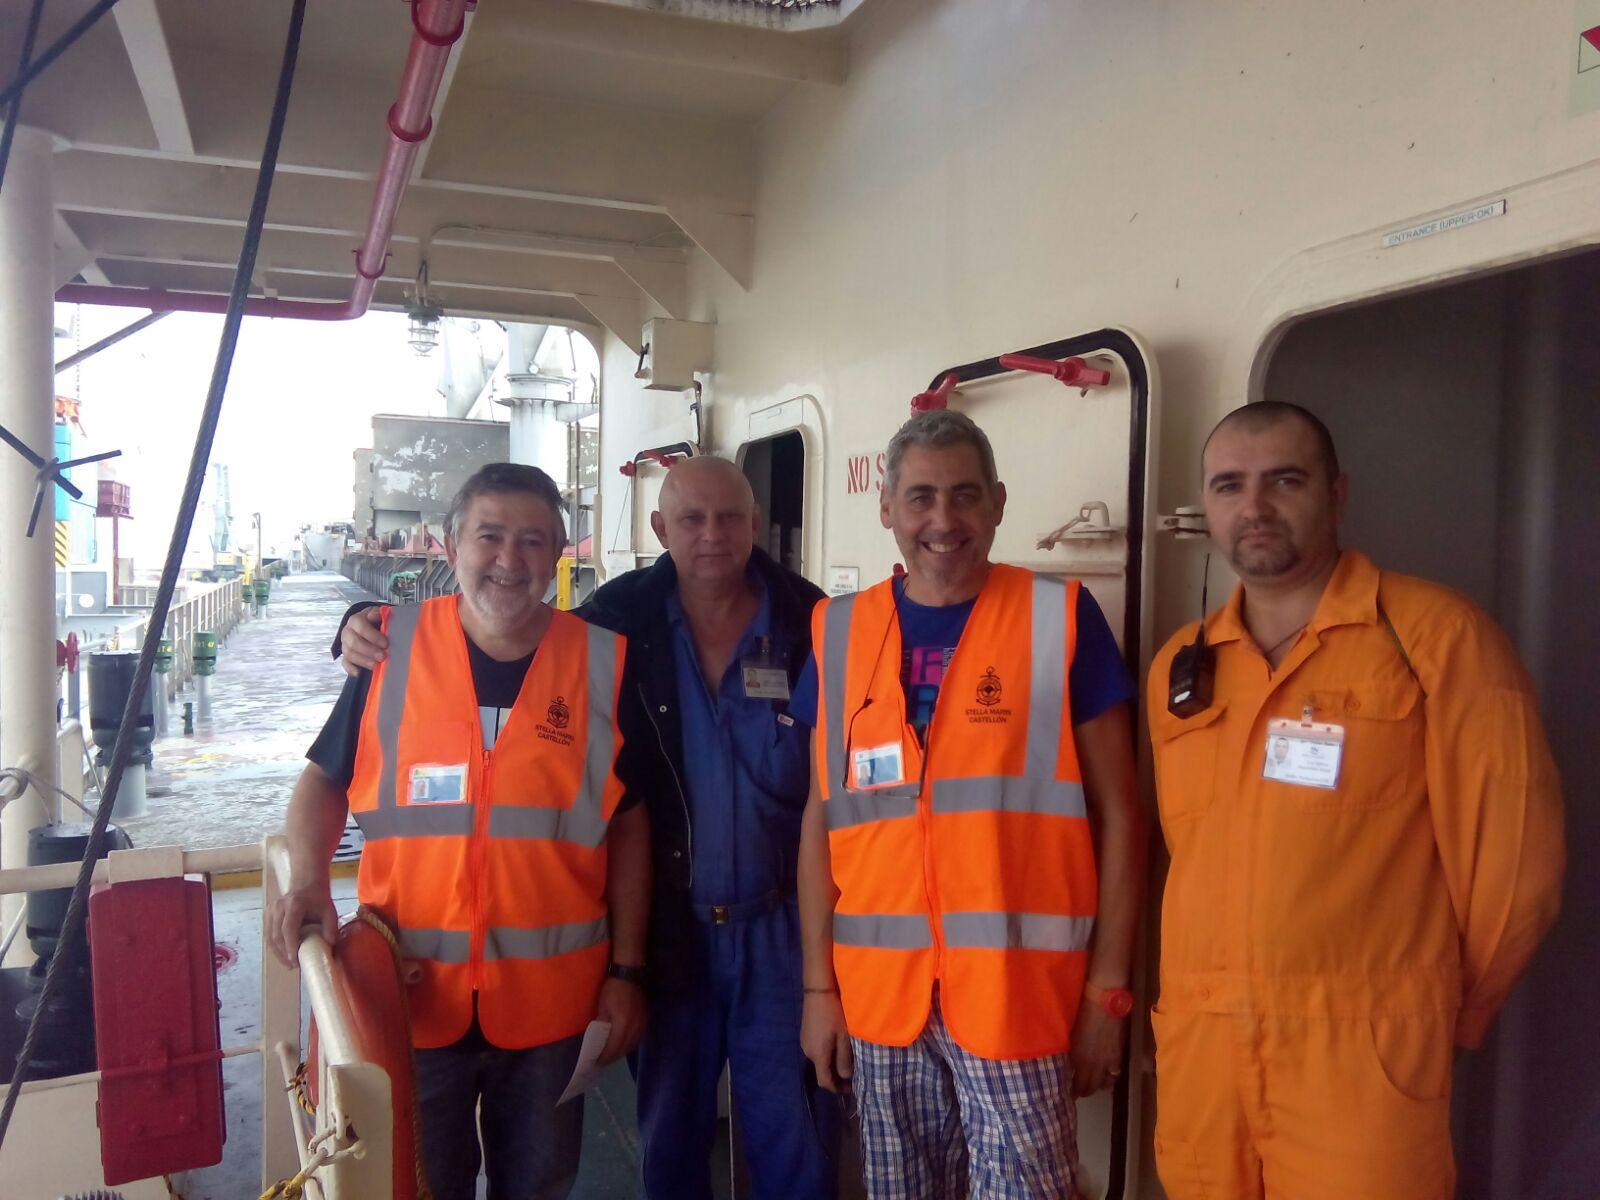 MV ESTELLAR BALTIC 16-10-17 (1)